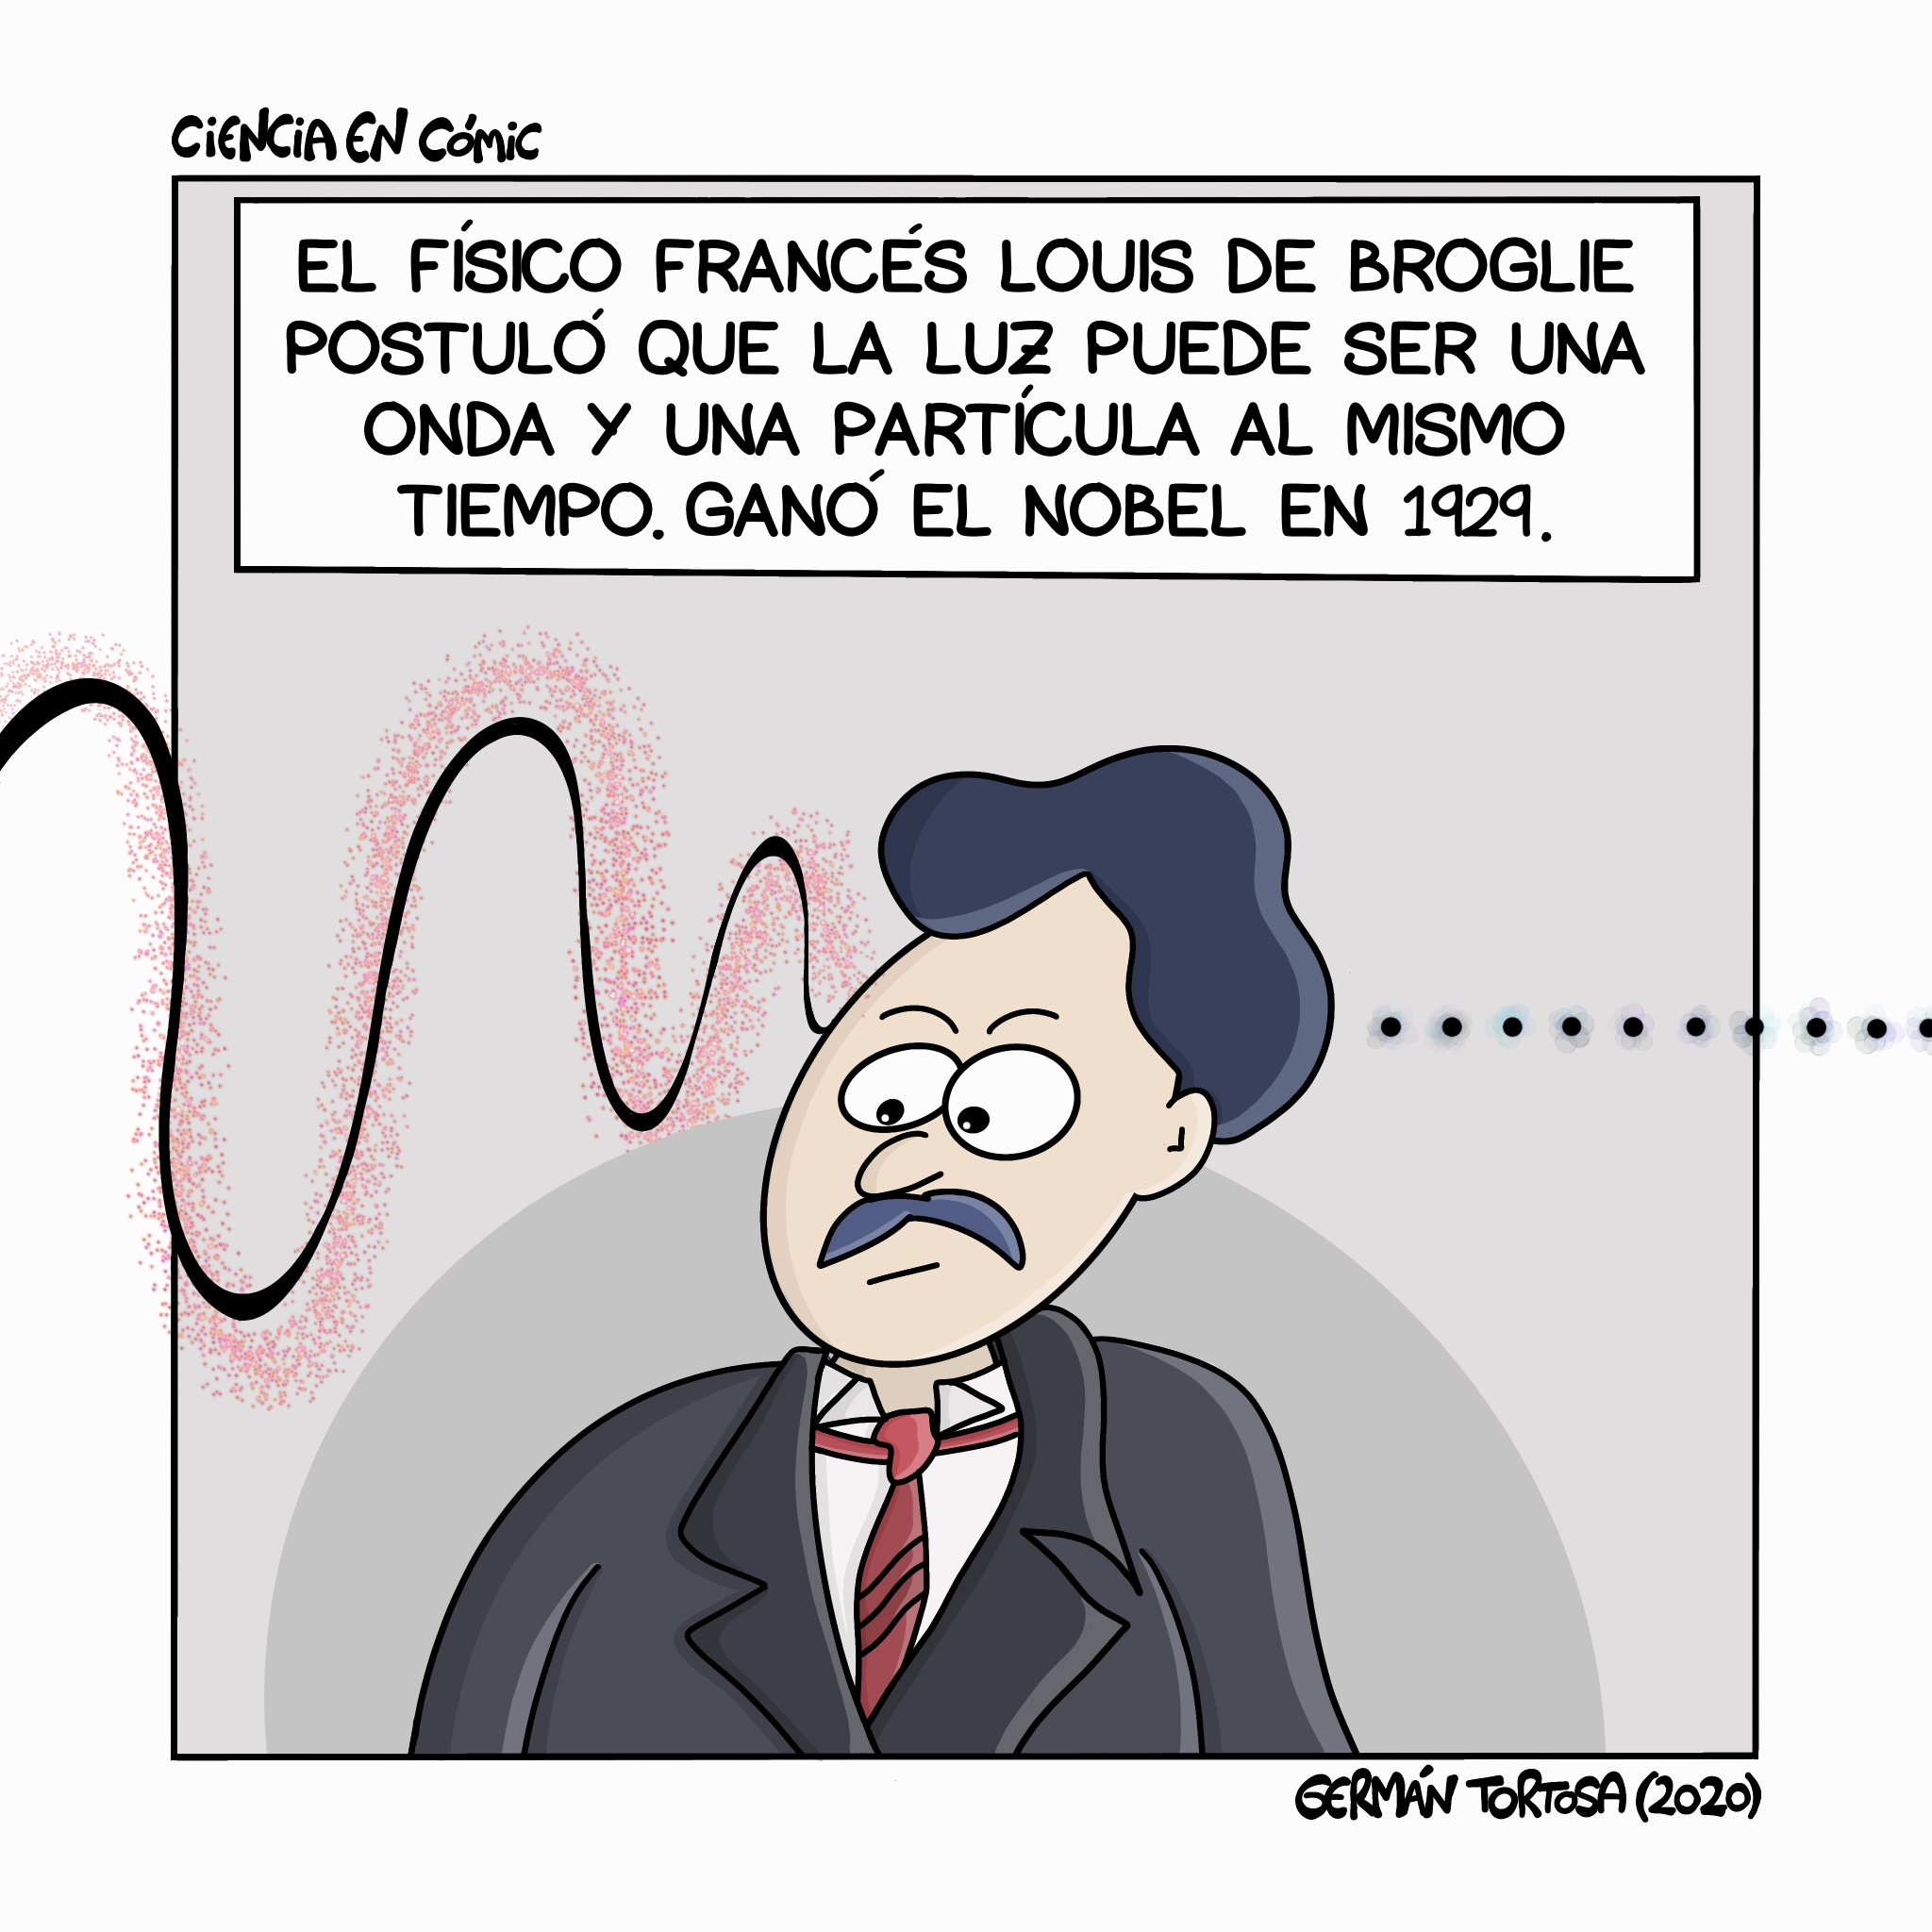 01) Microconceptos: Louis de Broglie